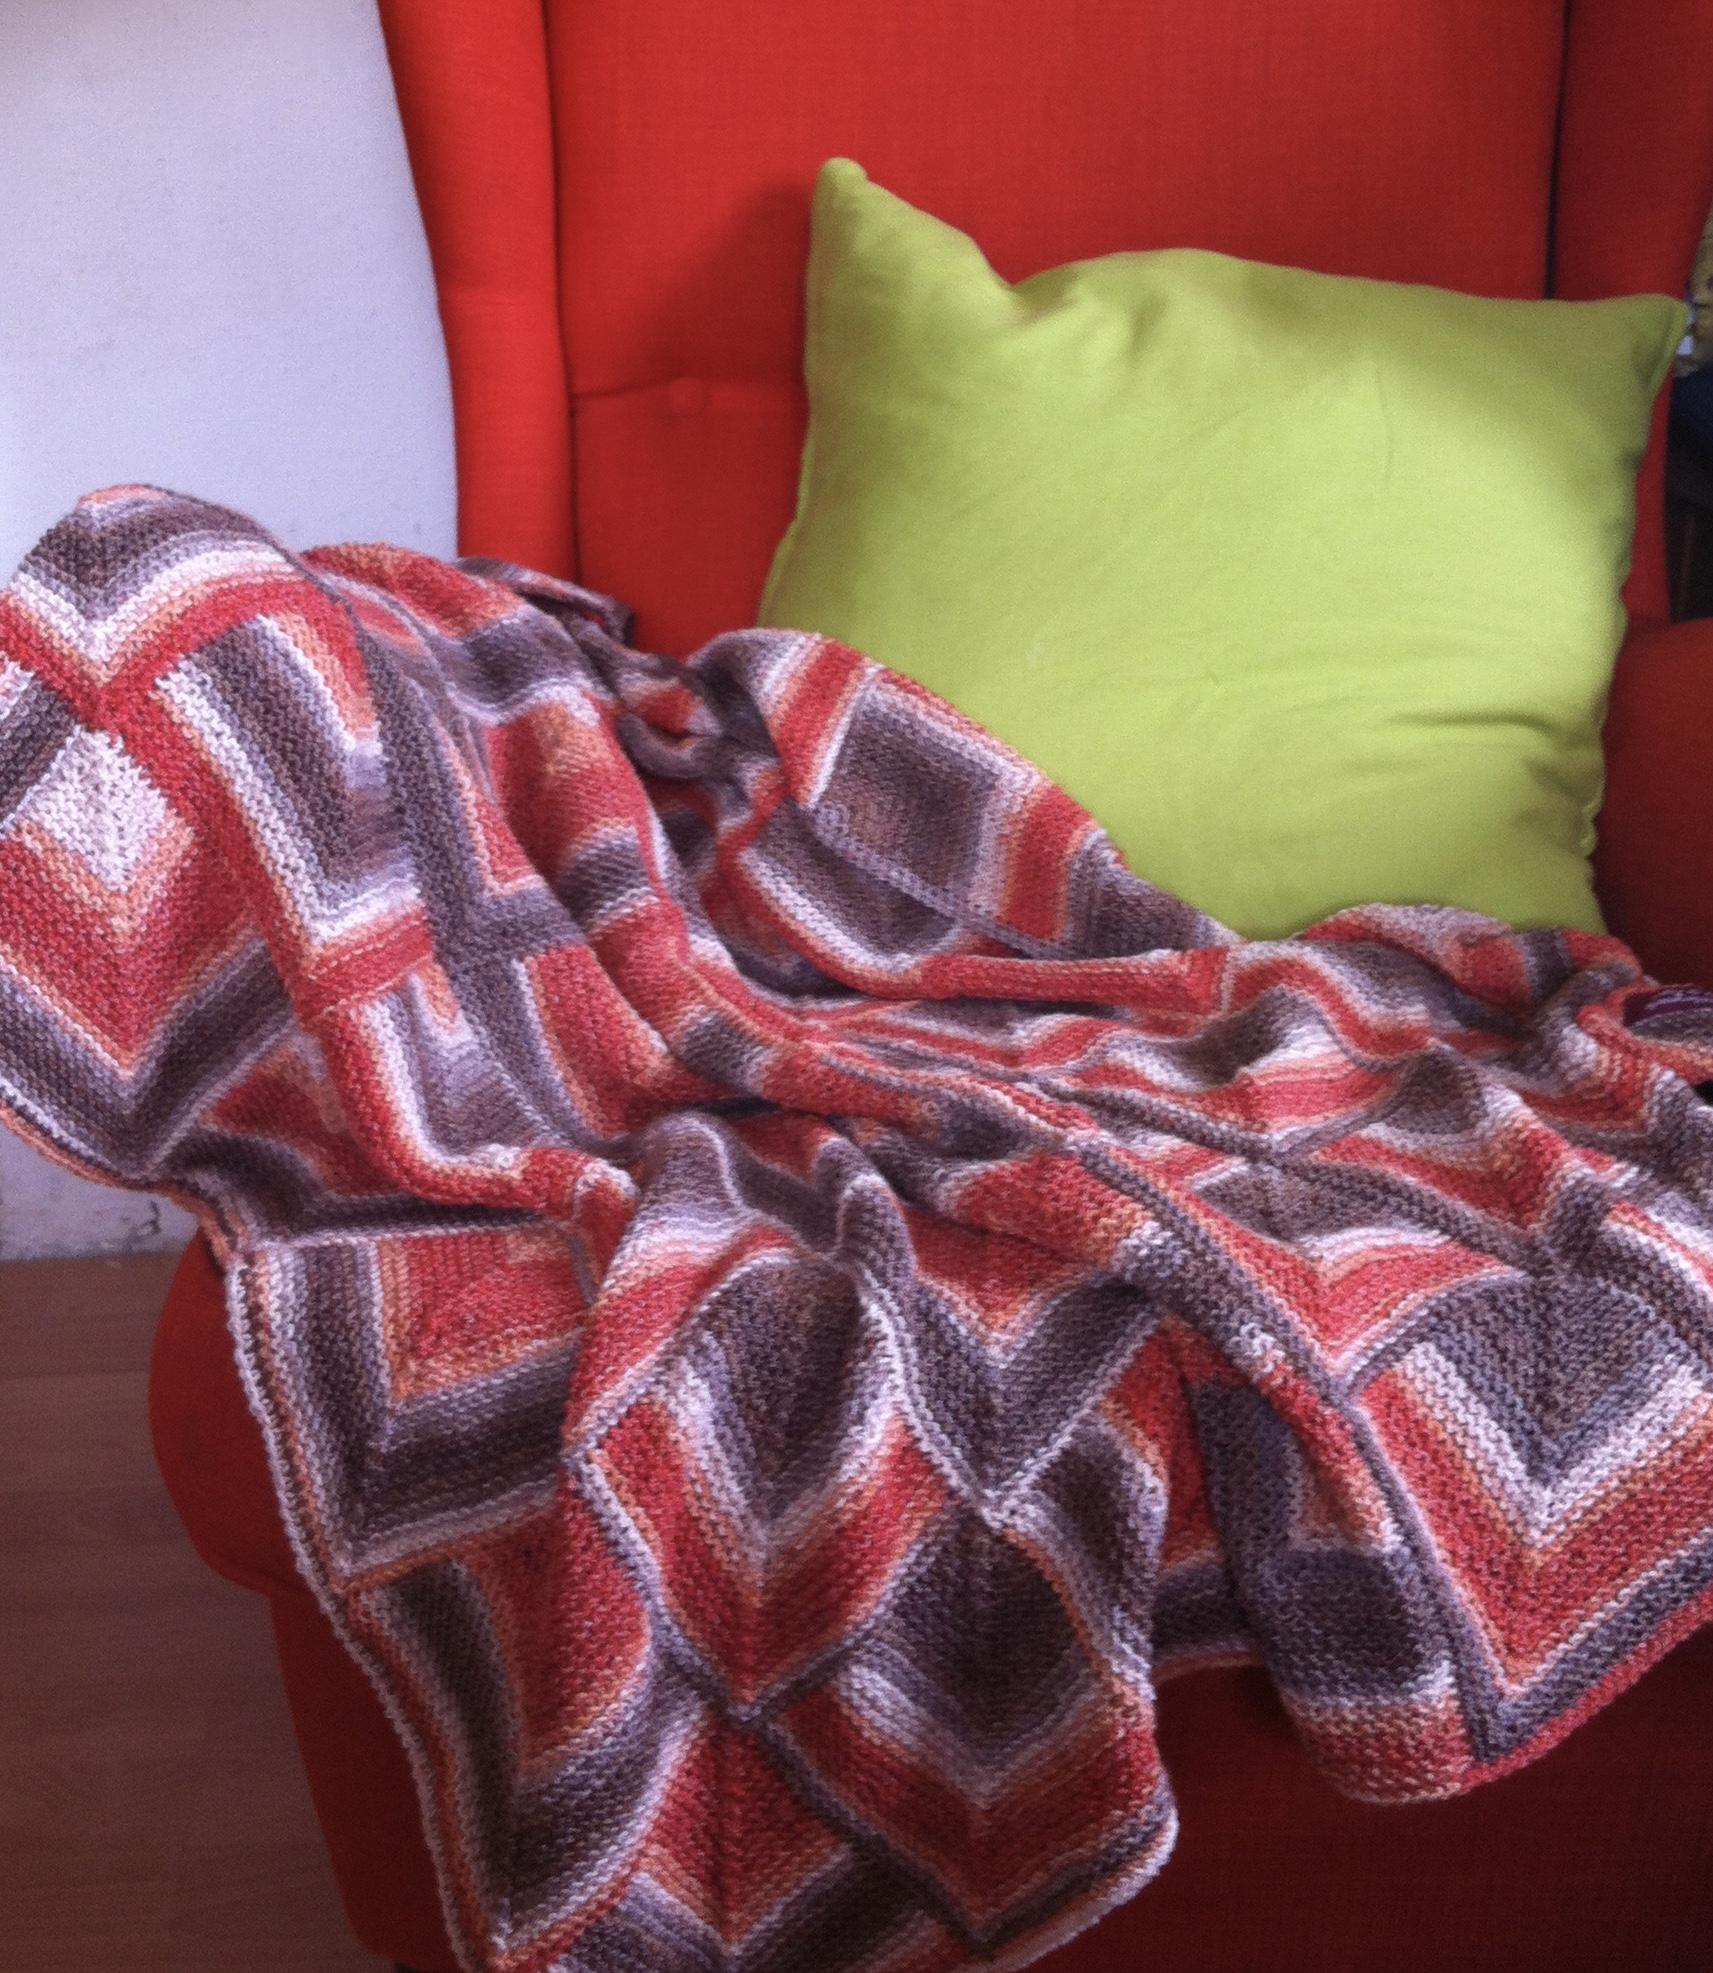 babydecke anleitung kreatives tohuwabohus webseite. Black Bedroom Furniture Sets. Home Design Ideas